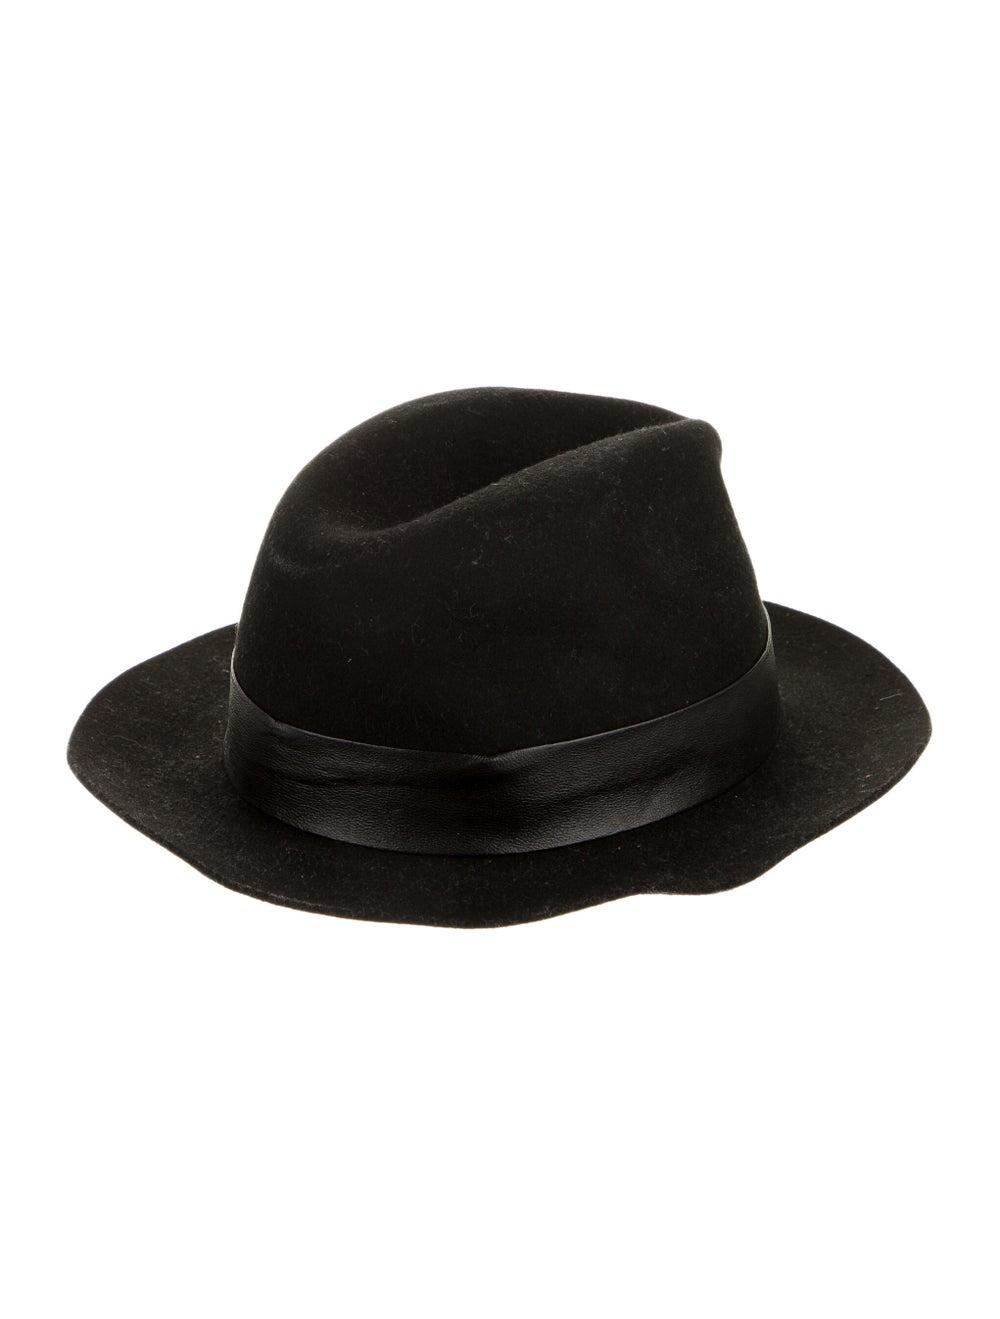 AllSaints Wool Fedora Hat black - image 2